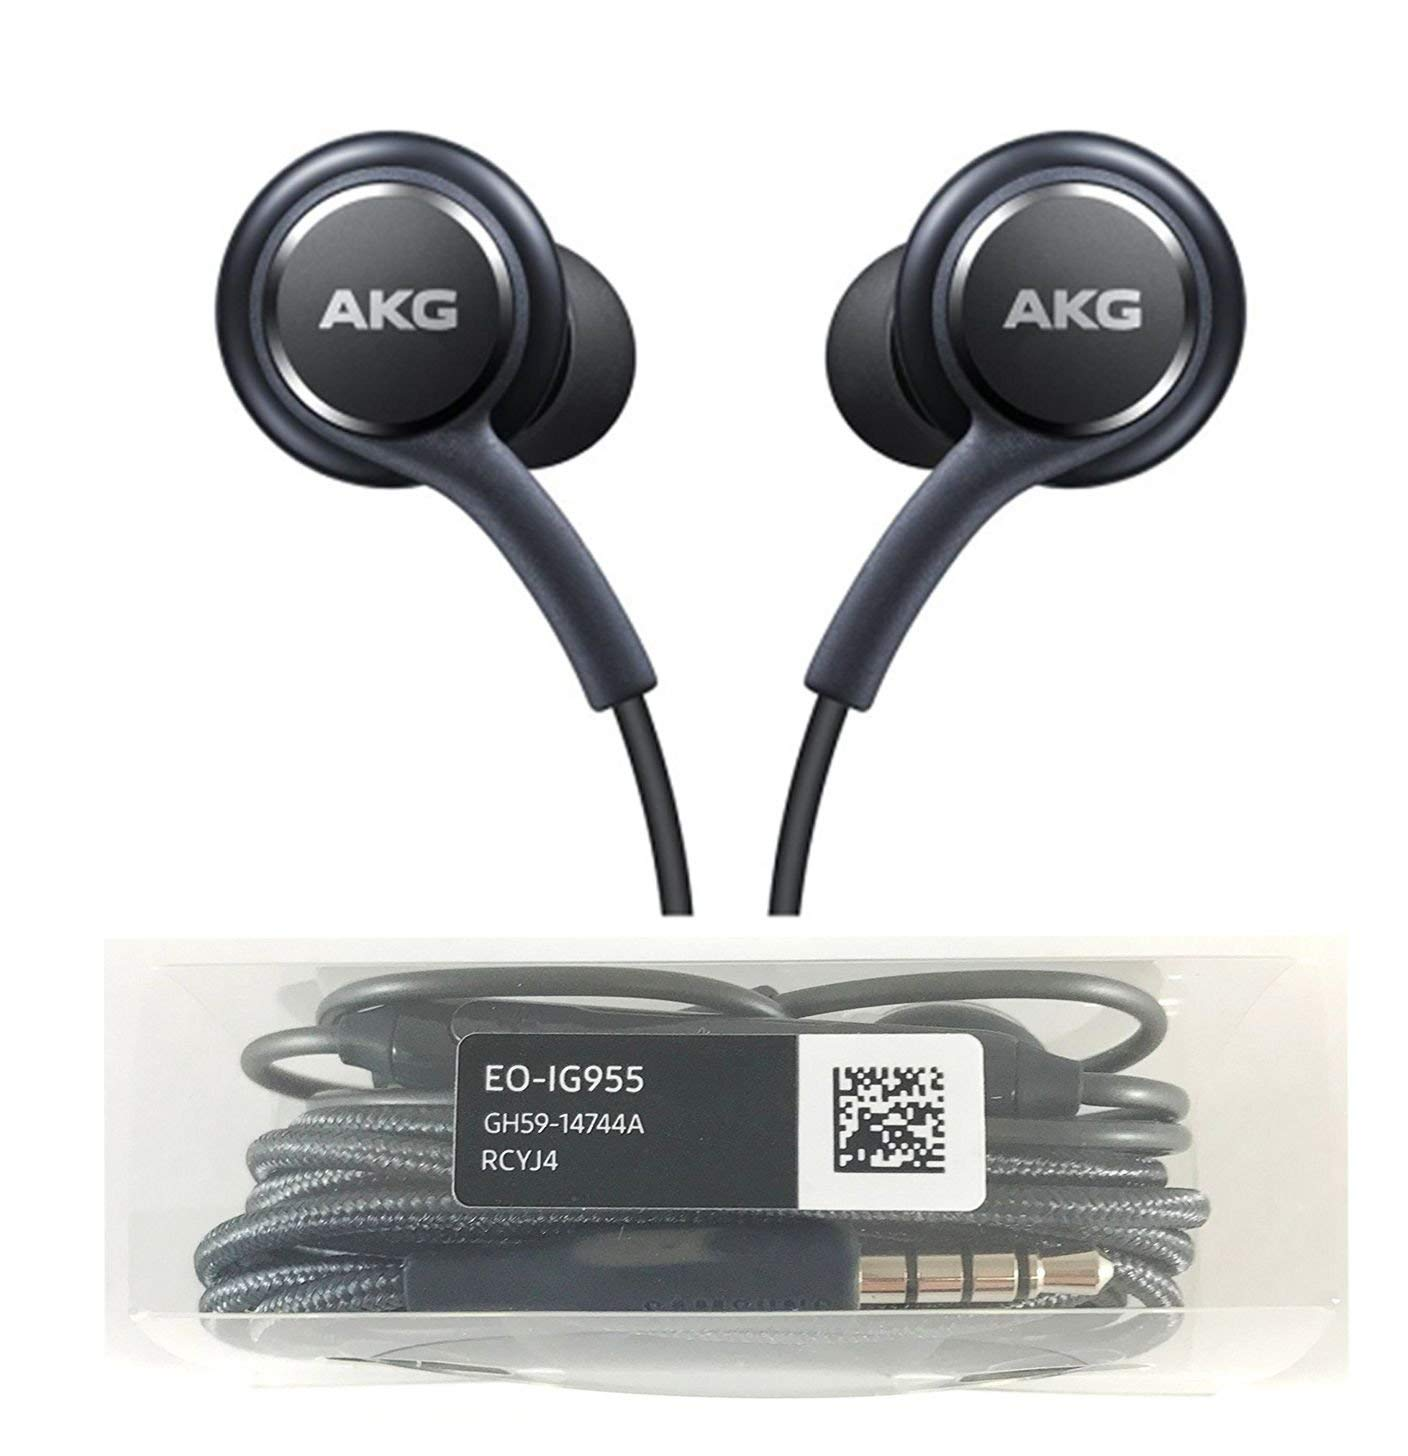 Mic Hands free Earphone AKG EO-IG955 Remote Earphones Headphones Headset Handsfree Black For Samsung Galaxy S8 /& S8 Plus